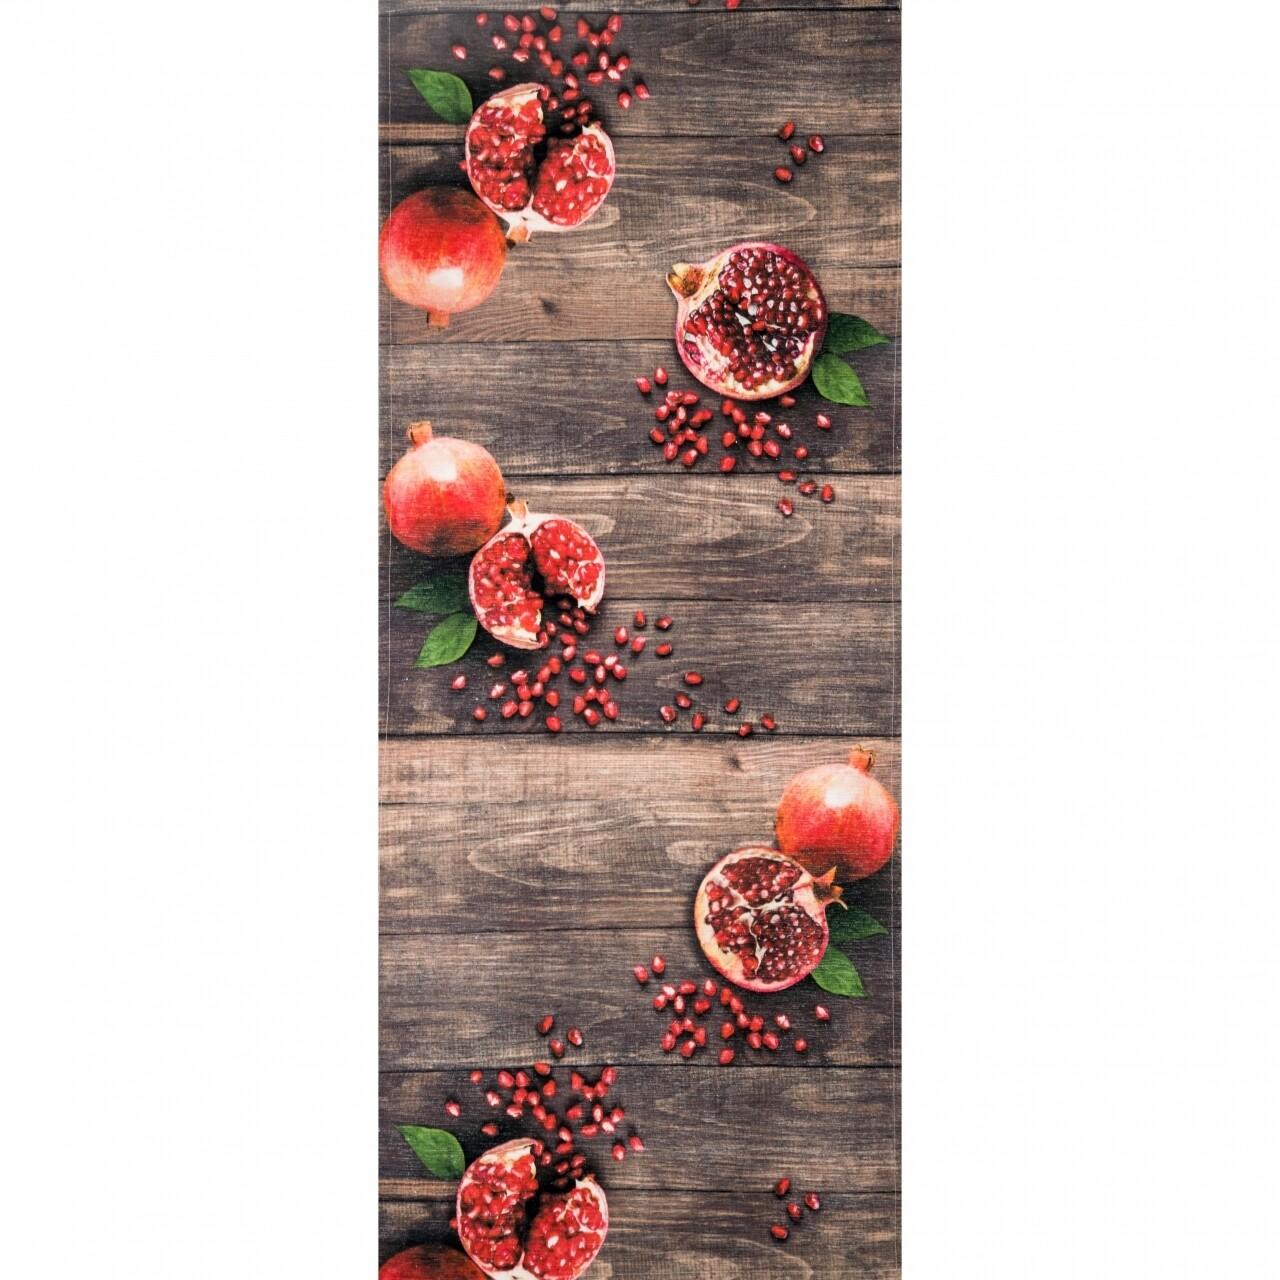 Covor rezistent Webtappeti MELOGRANA CM 58x140 cm, maro/rosu/verde